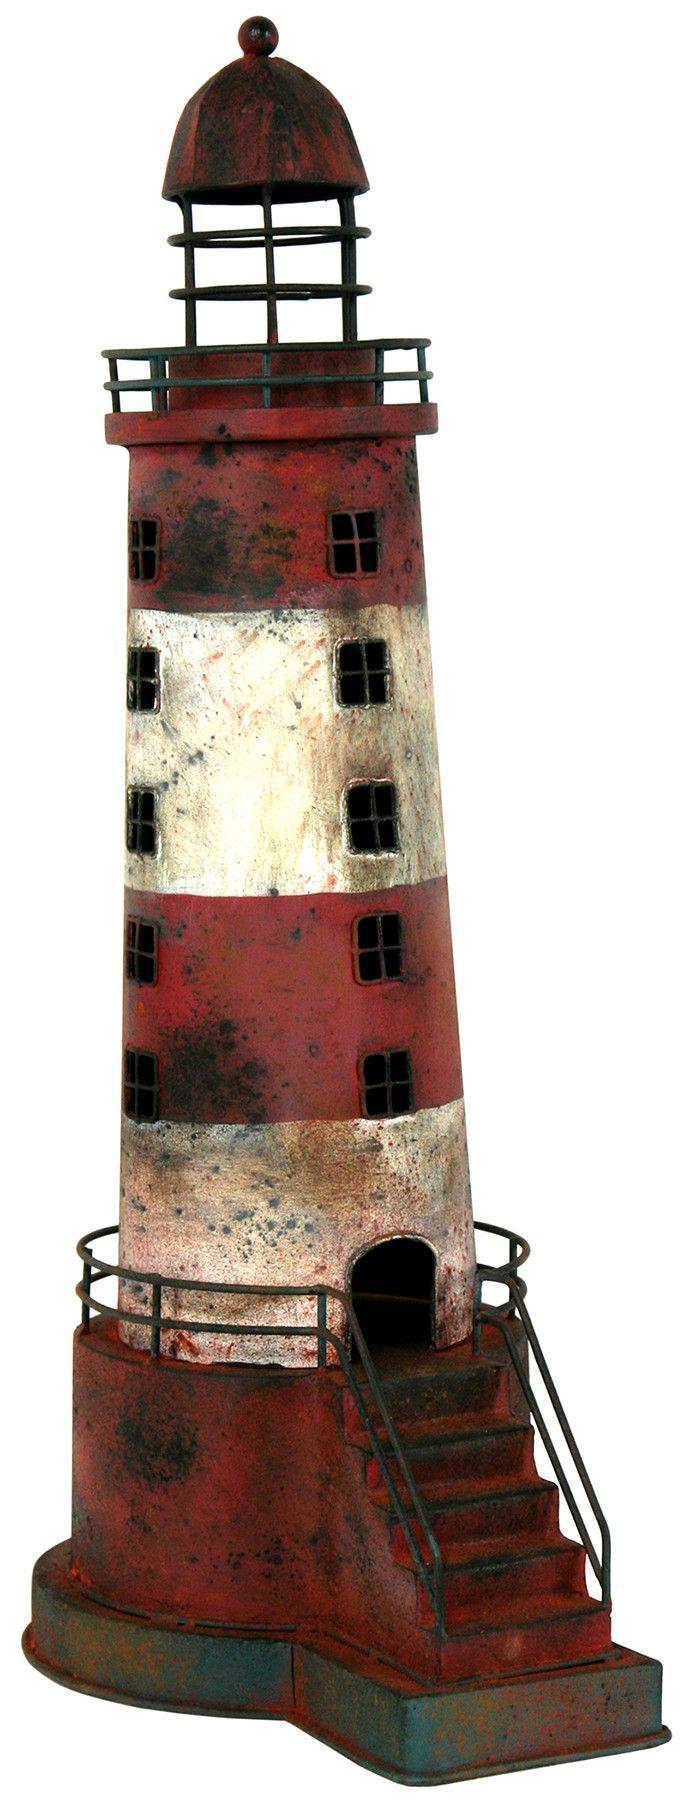 Cottage lighthouse lamp 3 colors - Lighthouse Table Art Sculpture 76 99 At Wayfair Com